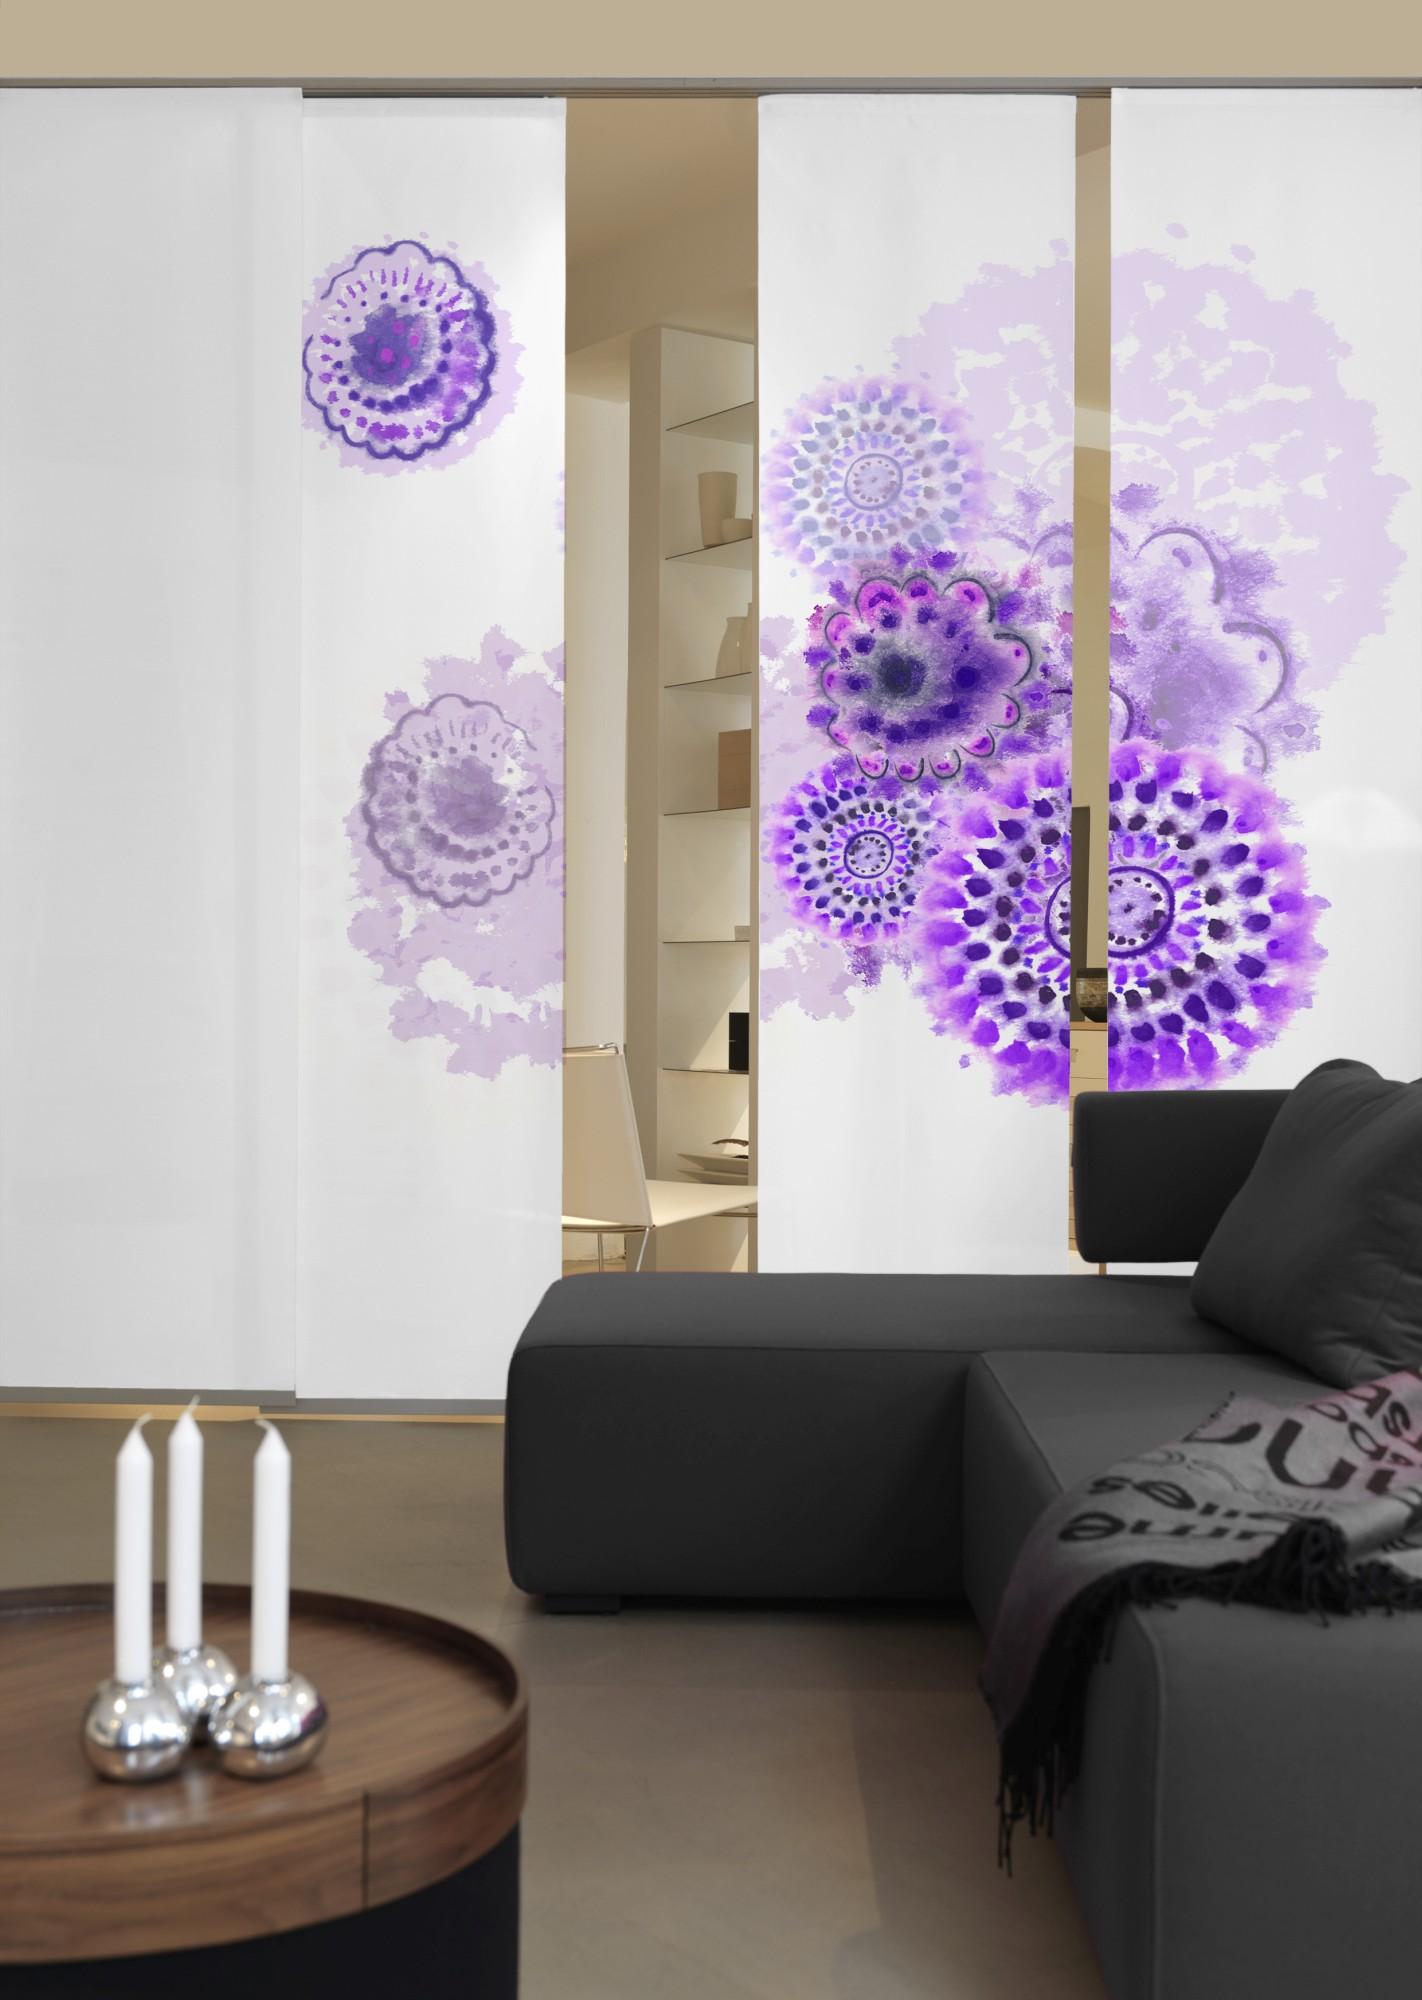 Bekannt Emotion Textiles Flächenvorhang Schiebevorhang Batikblume lila PE79